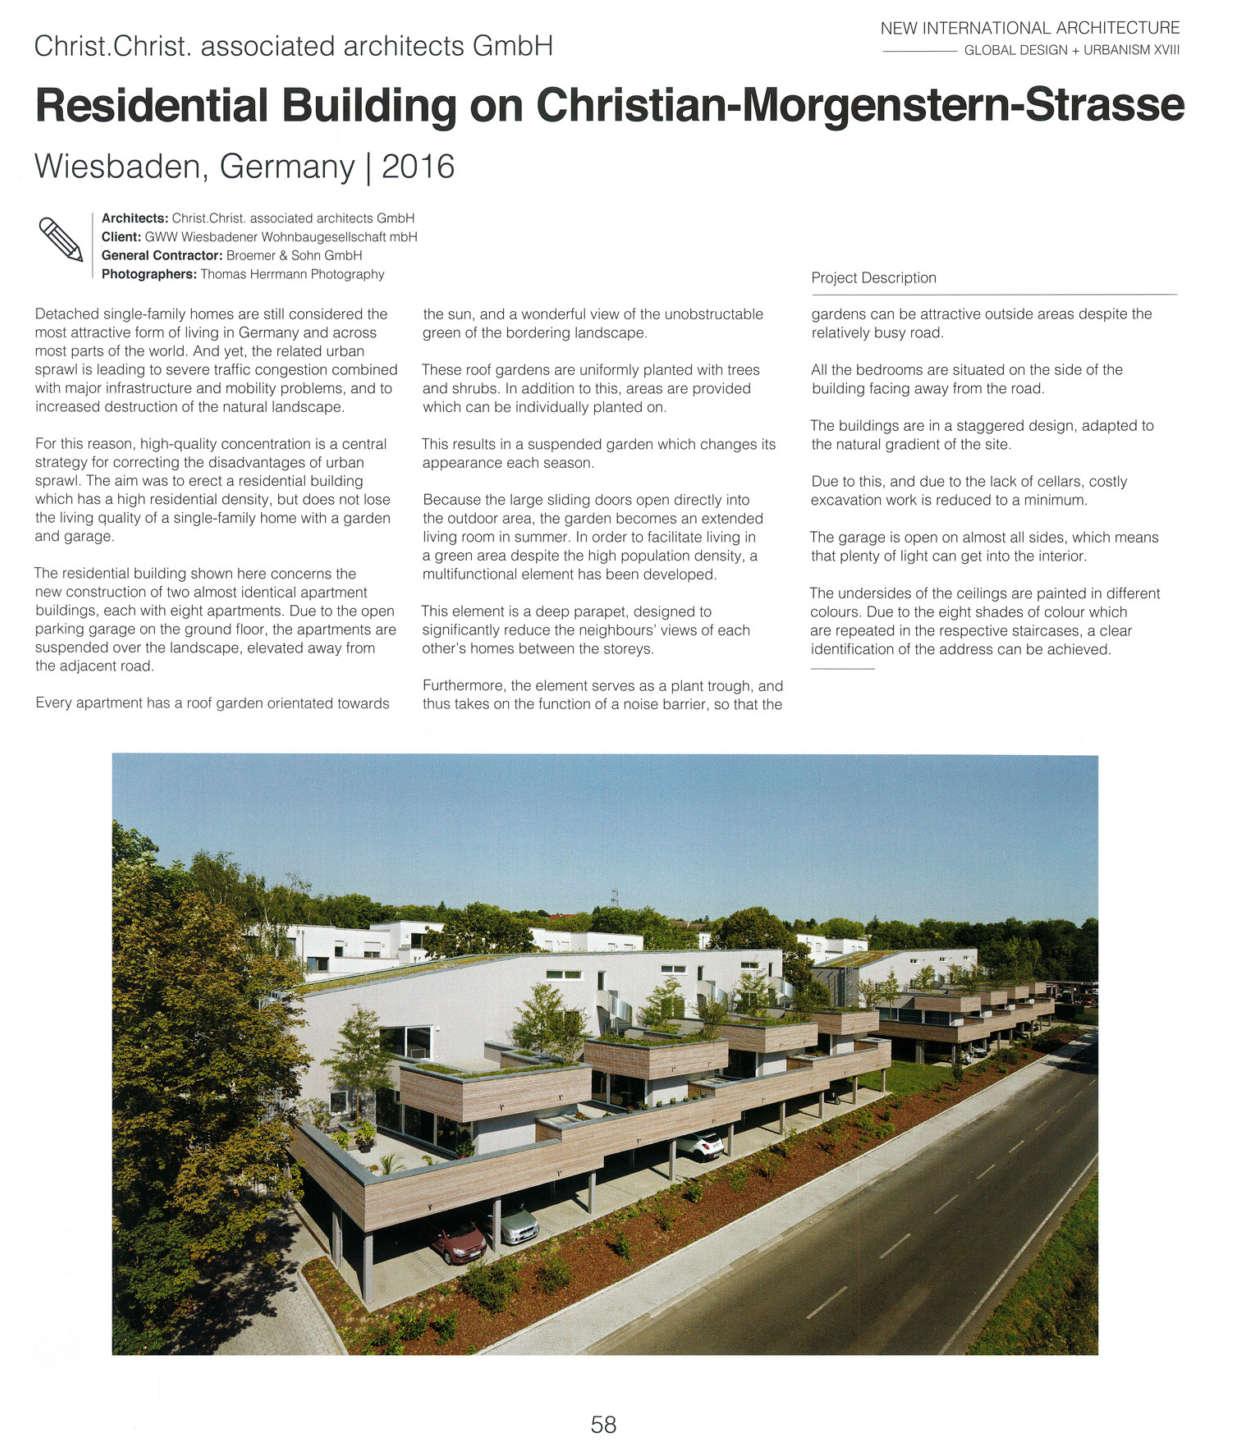 New International Architecture 02